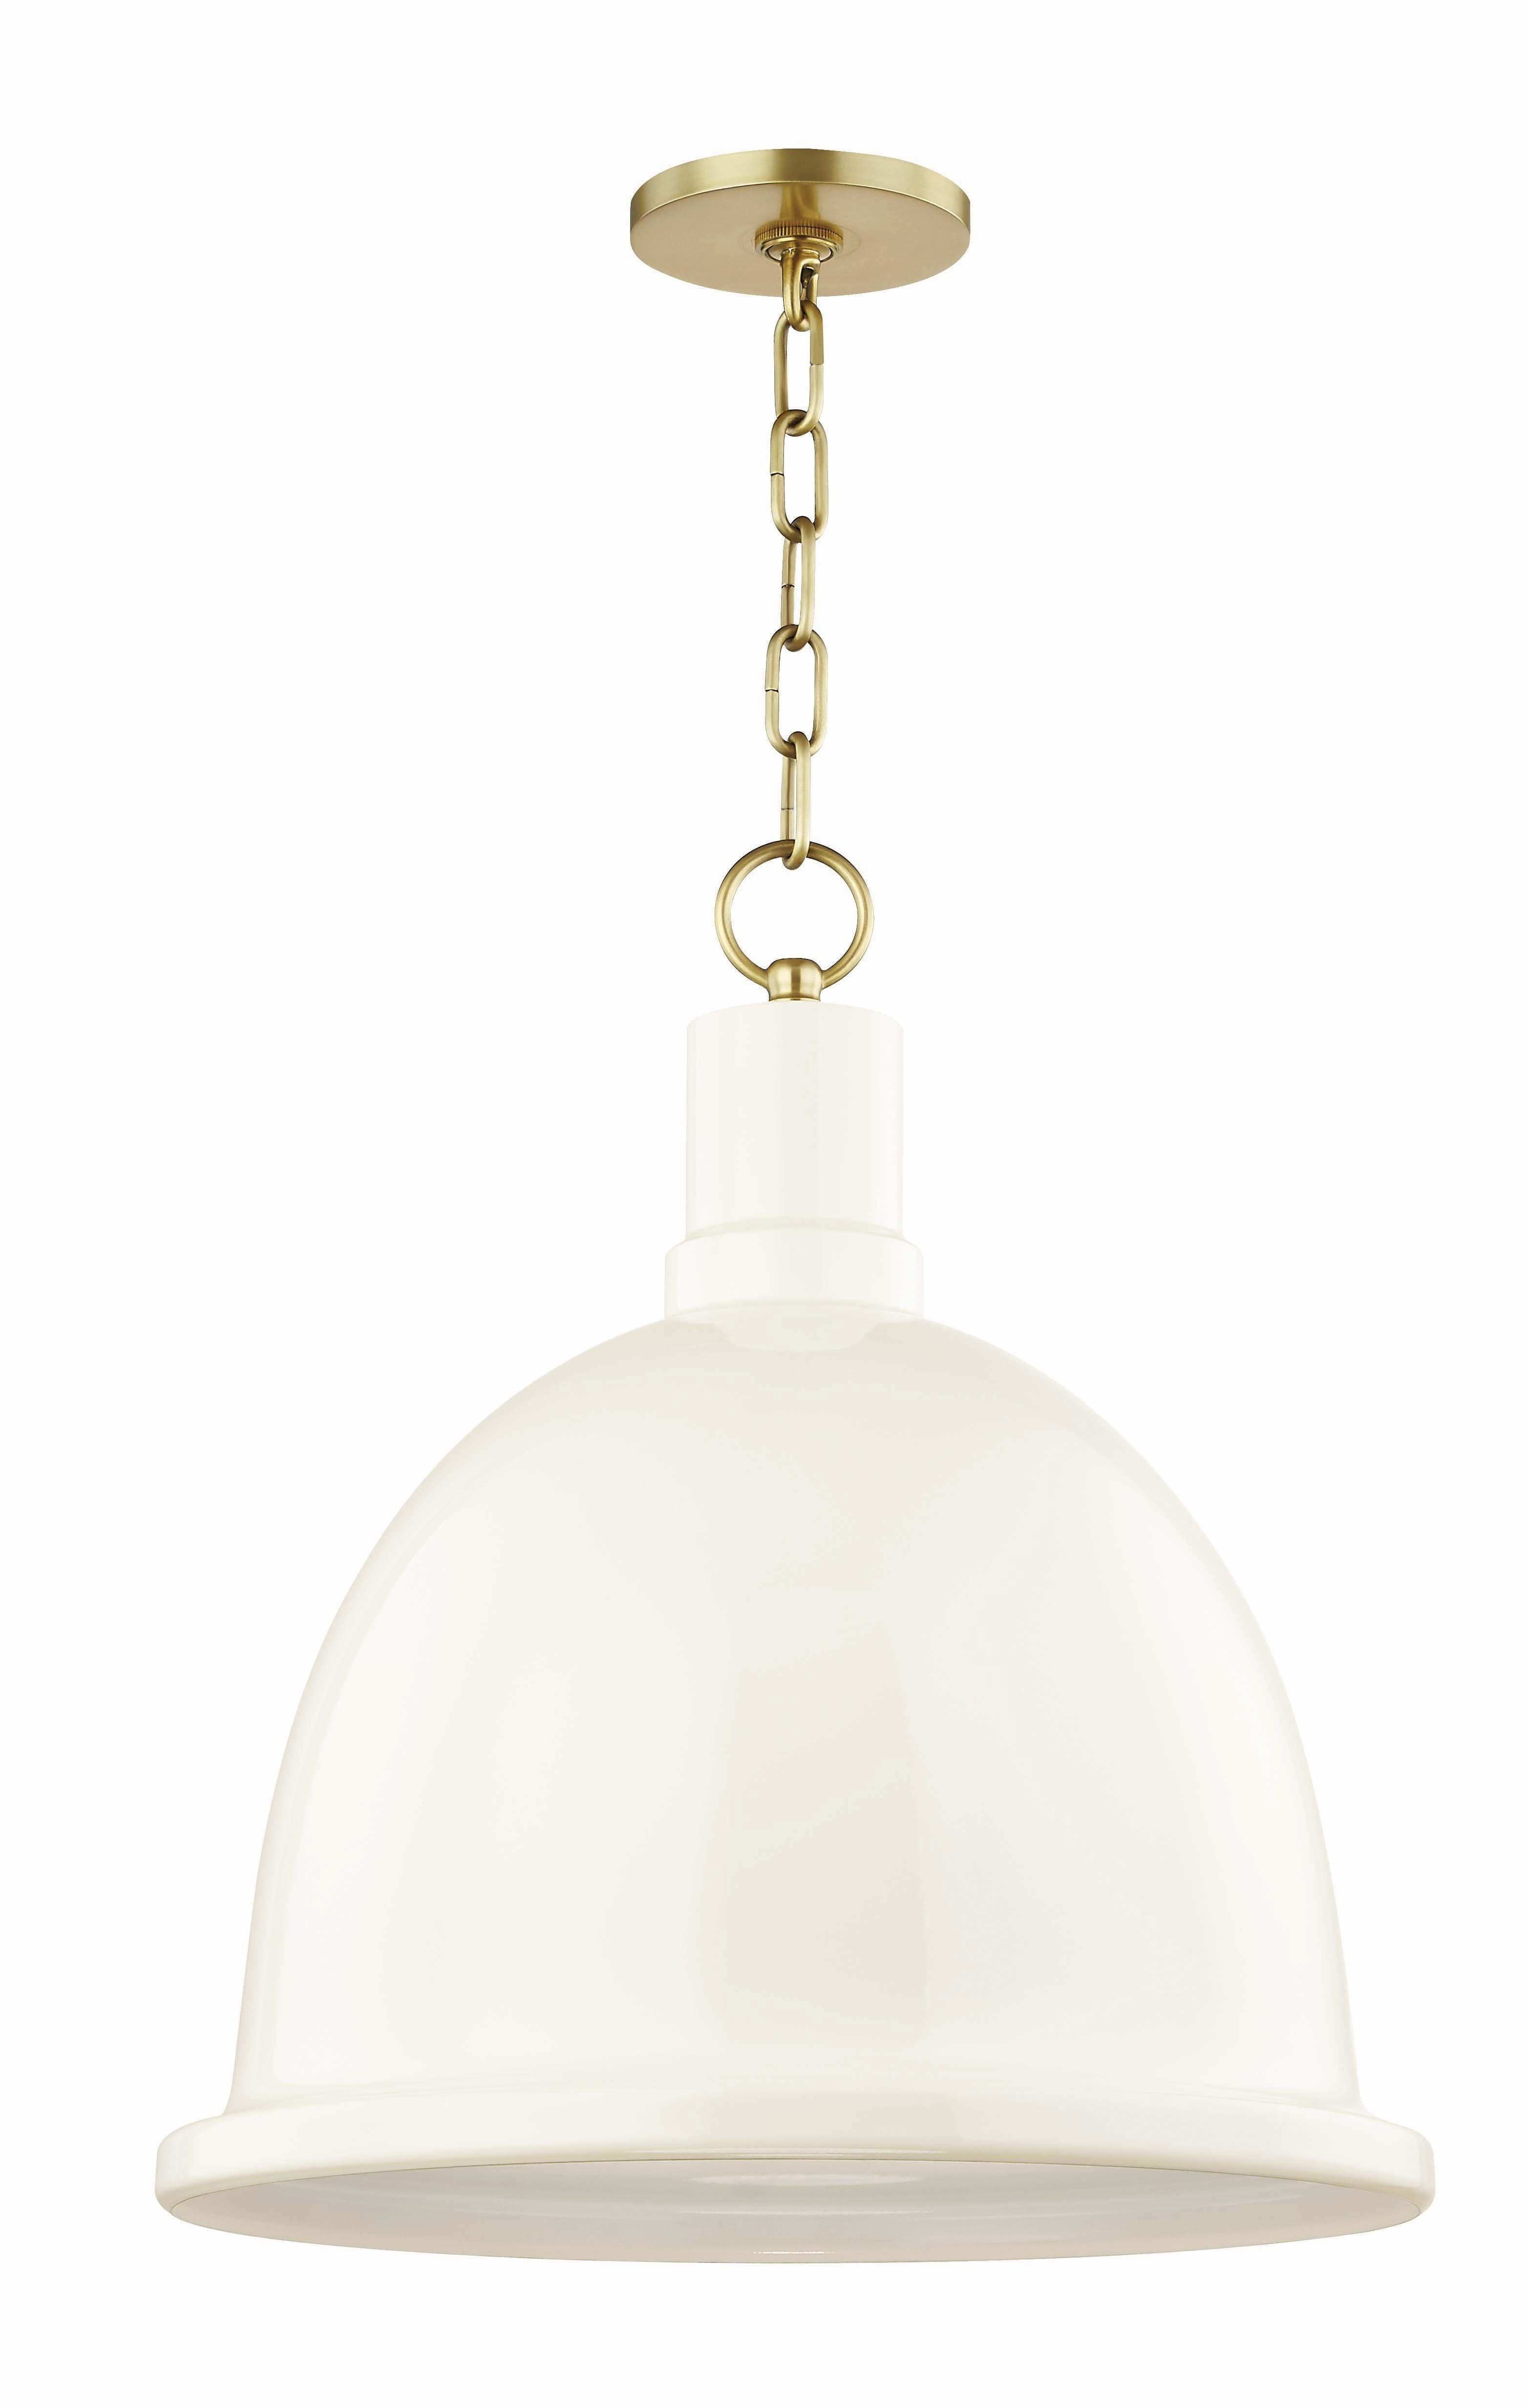 Baza Pendant Aged Brass And Cream Pendant Lamp Dome Pendant Lighting Brass Pendant Light